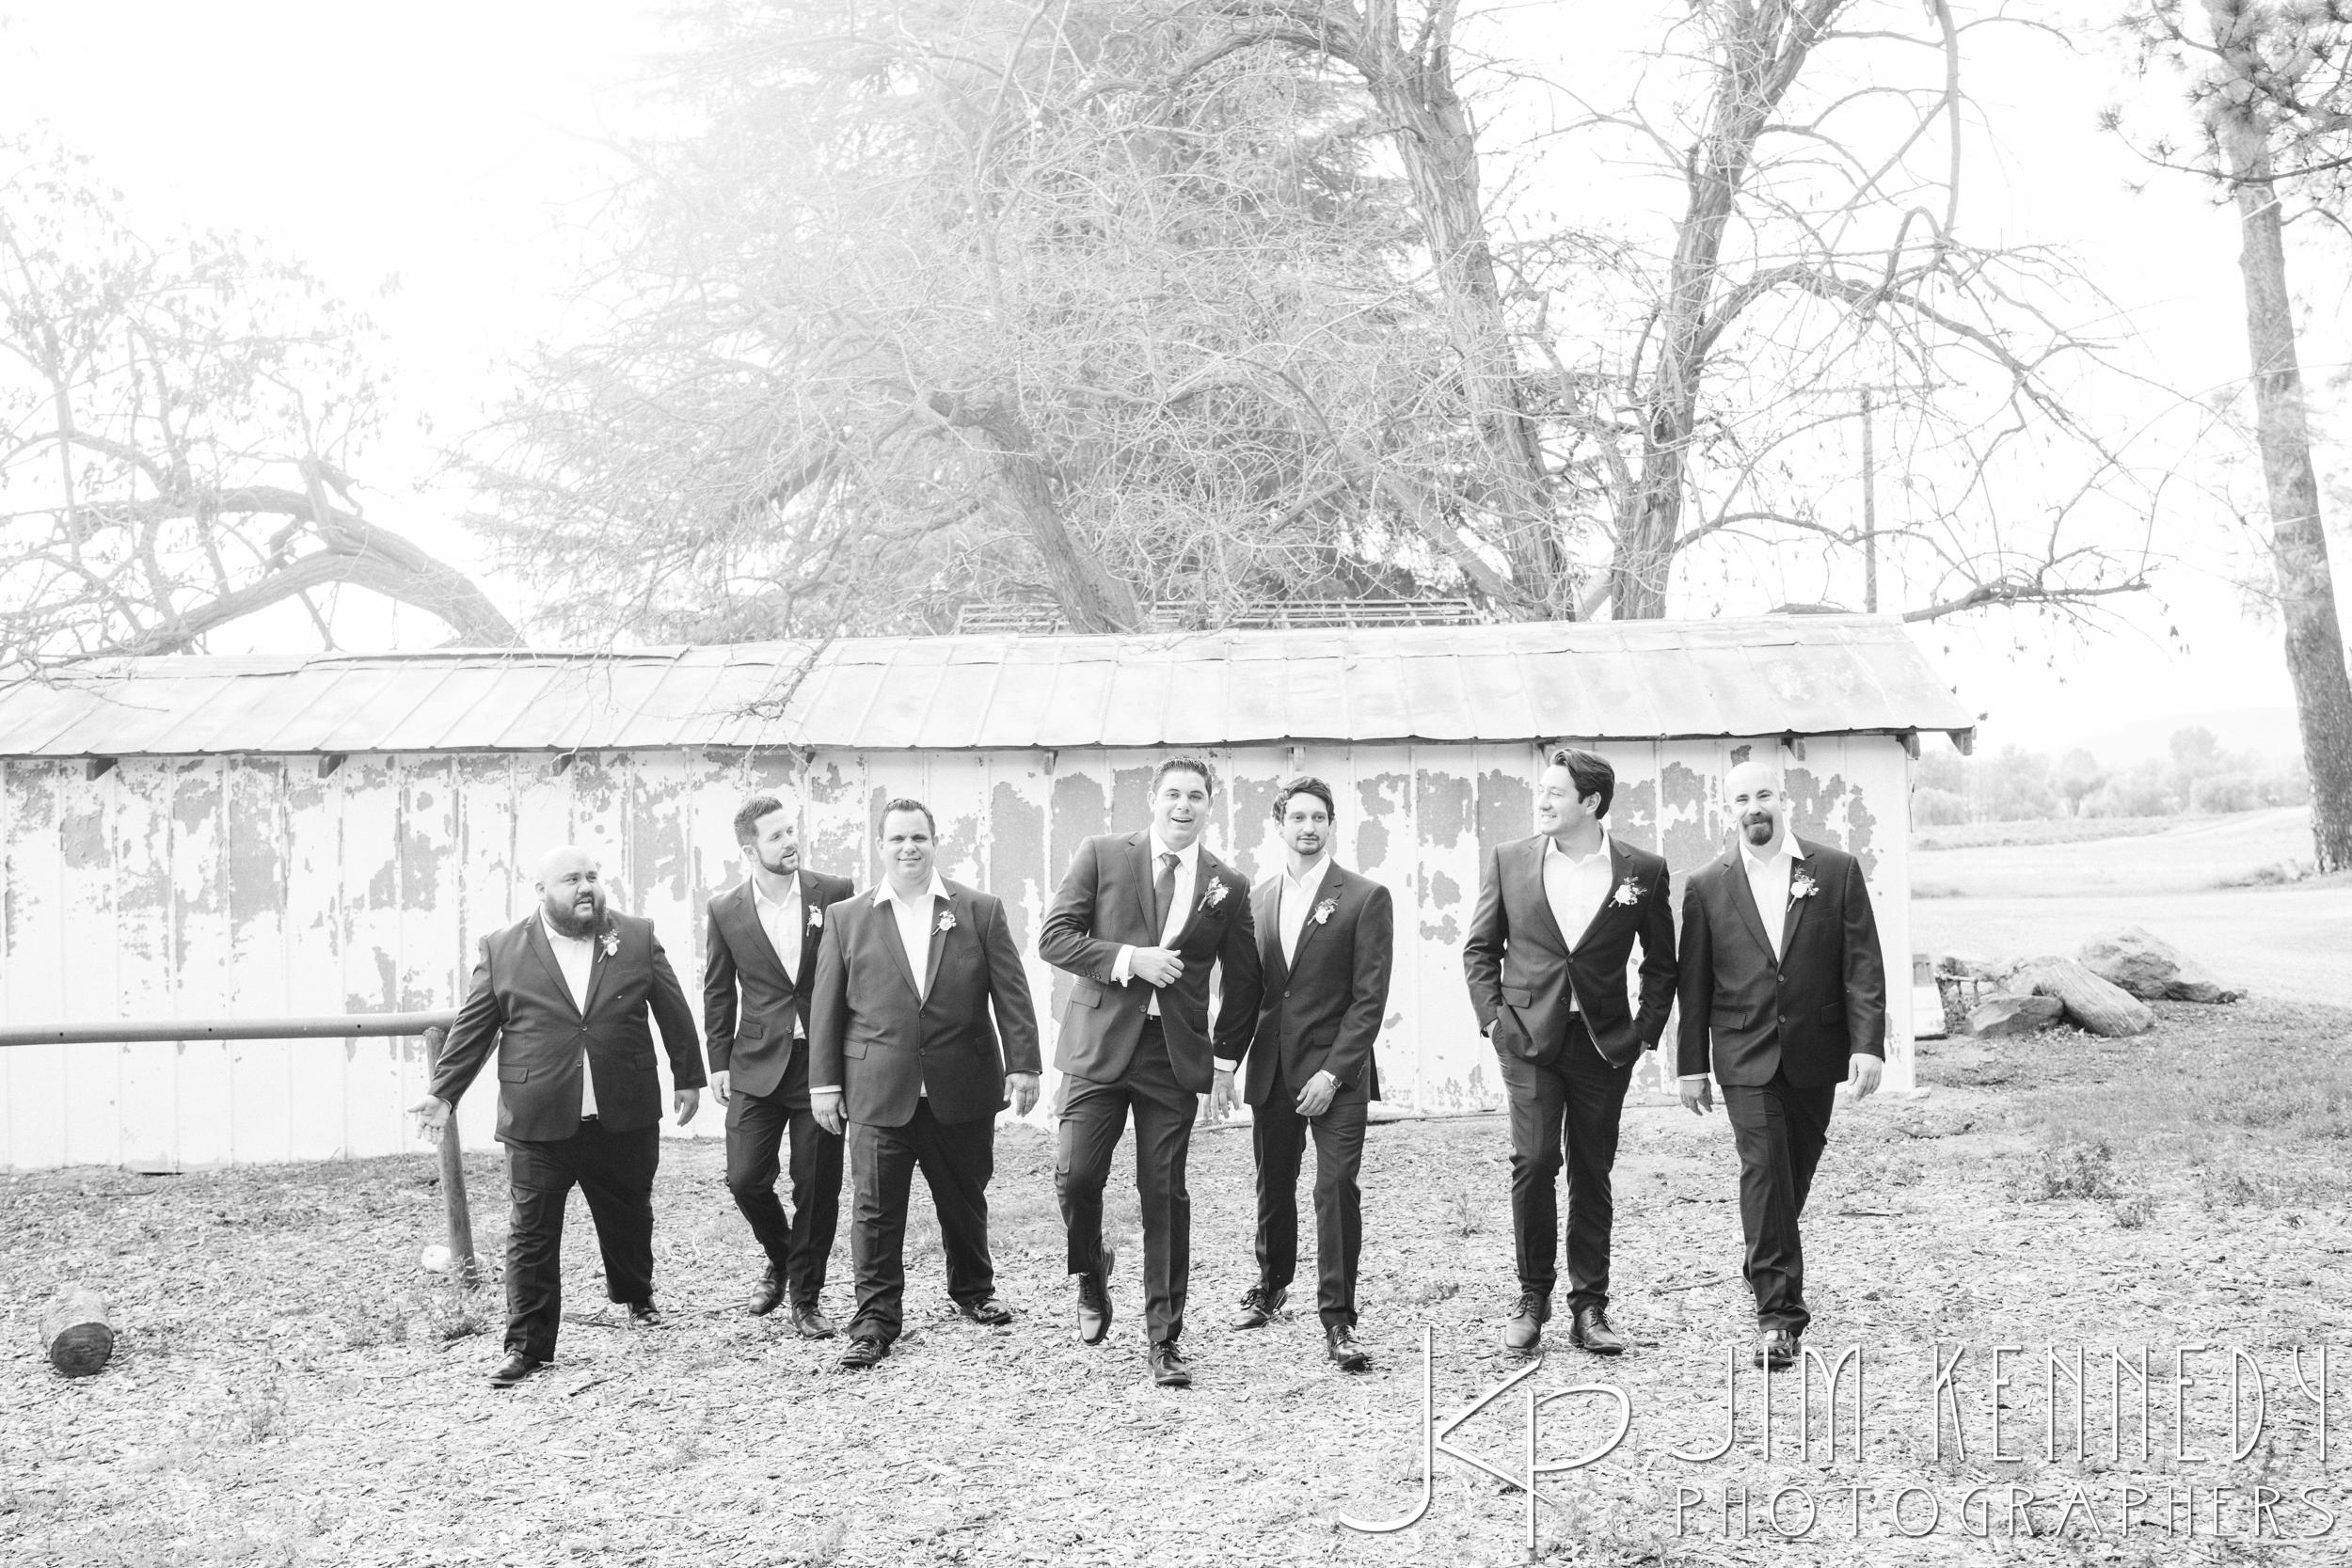 jim_kennedy_photographers_highland_springs_wedding_caitlyn_0095.jpg